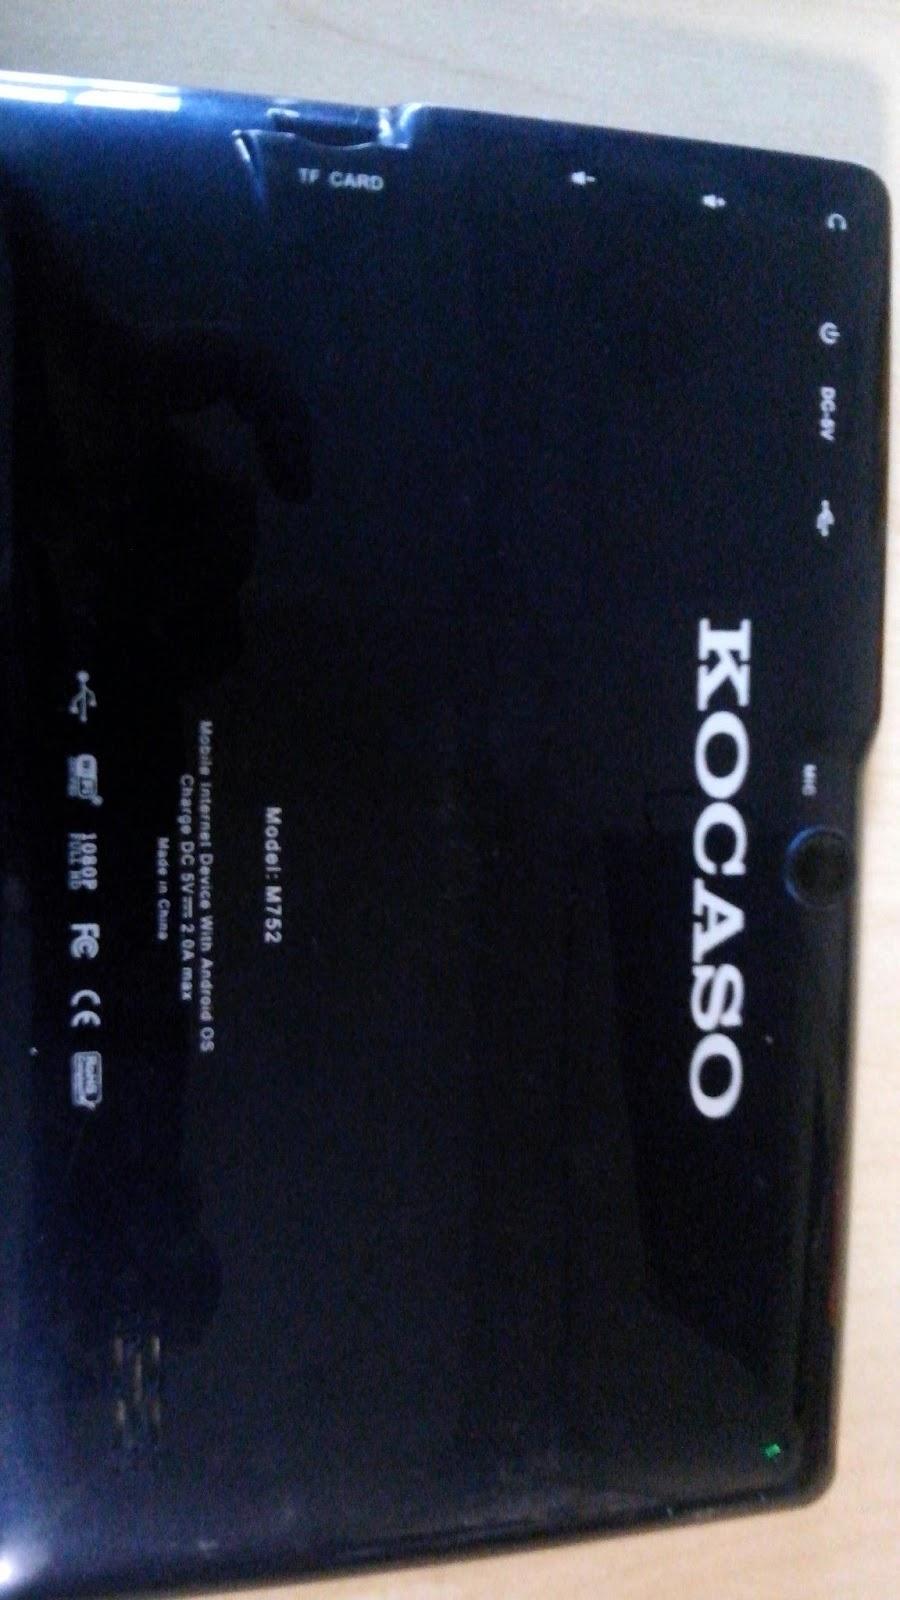 rockchip rk3026 firmware playtab 9 link descarga